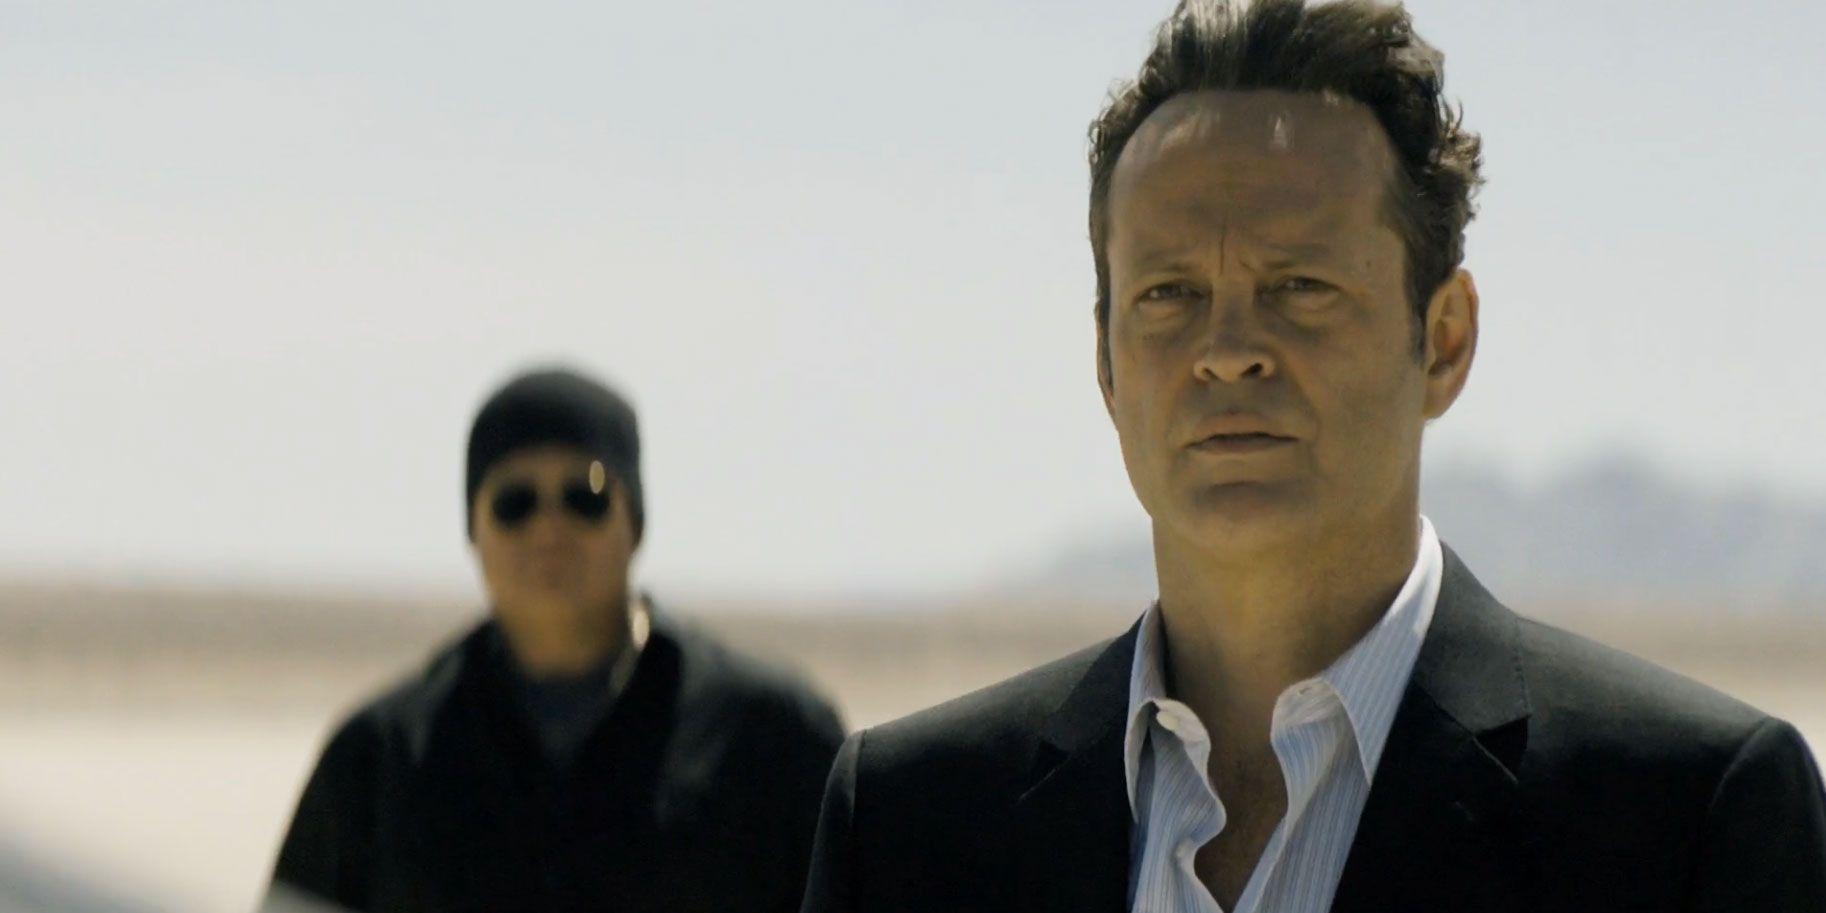 Contento Avispón Ejecutable  True Detective Season 2 - Where Did Each Character End Up?